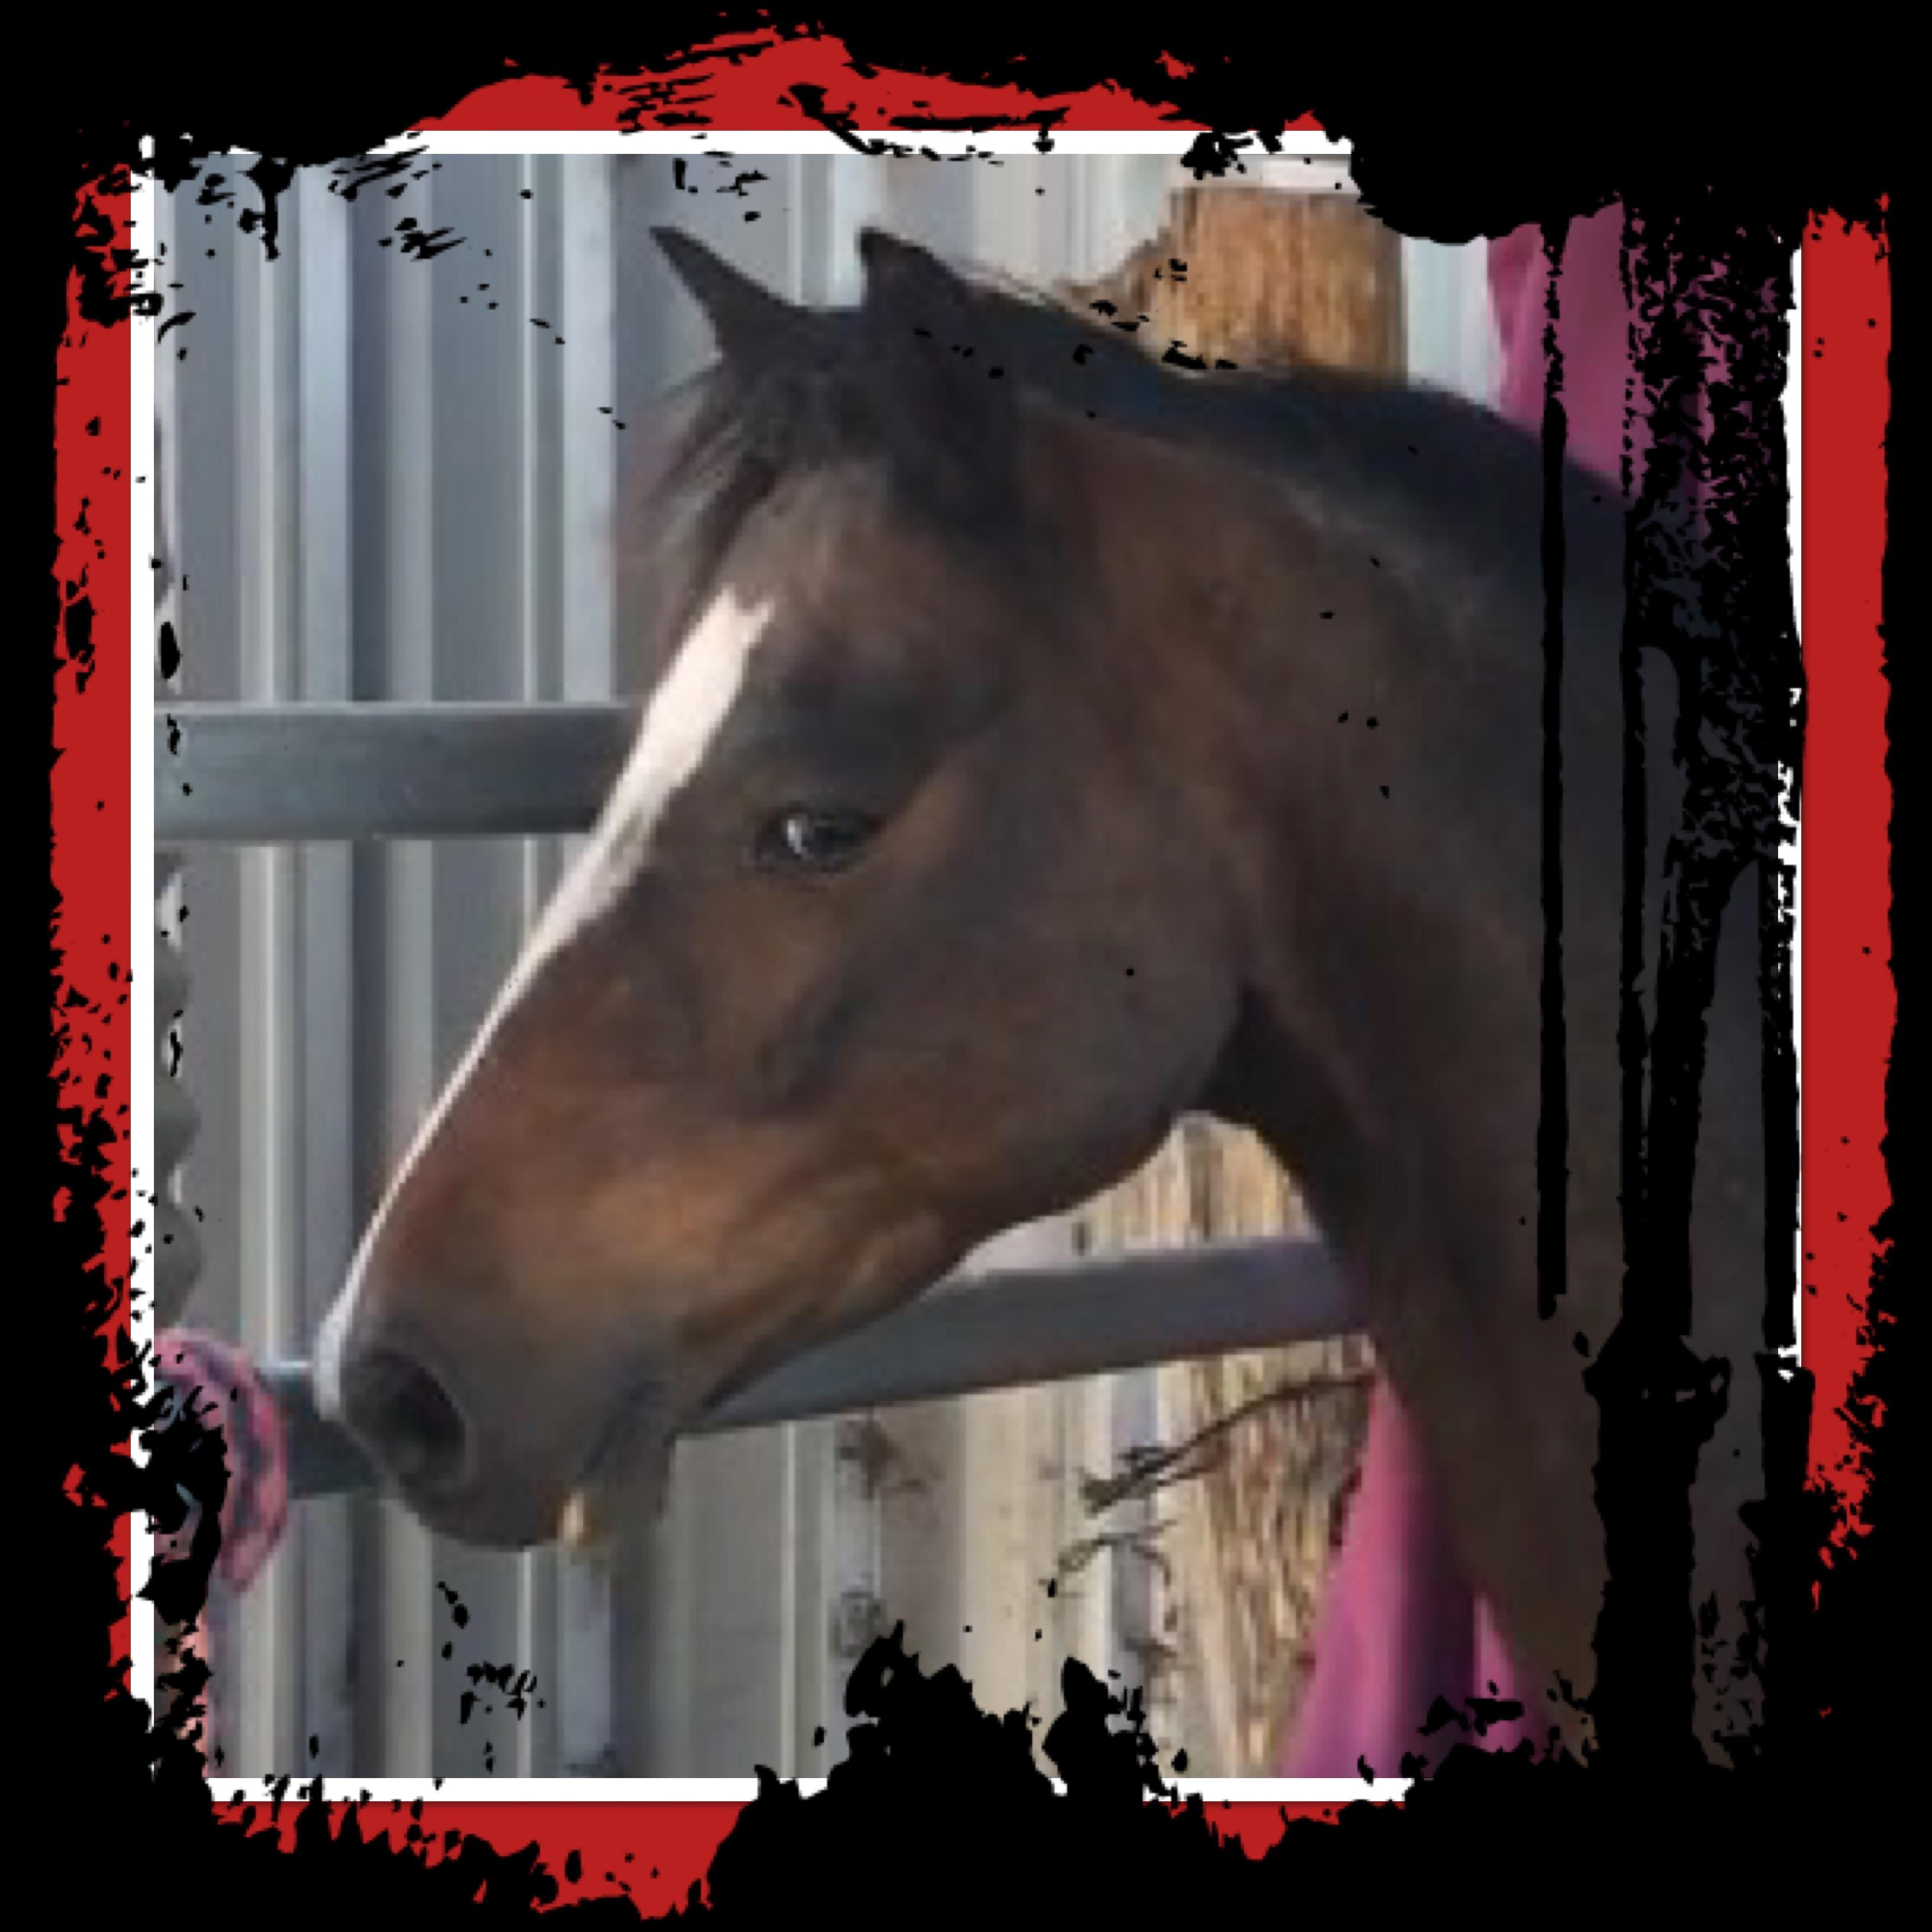 Welsh X pony